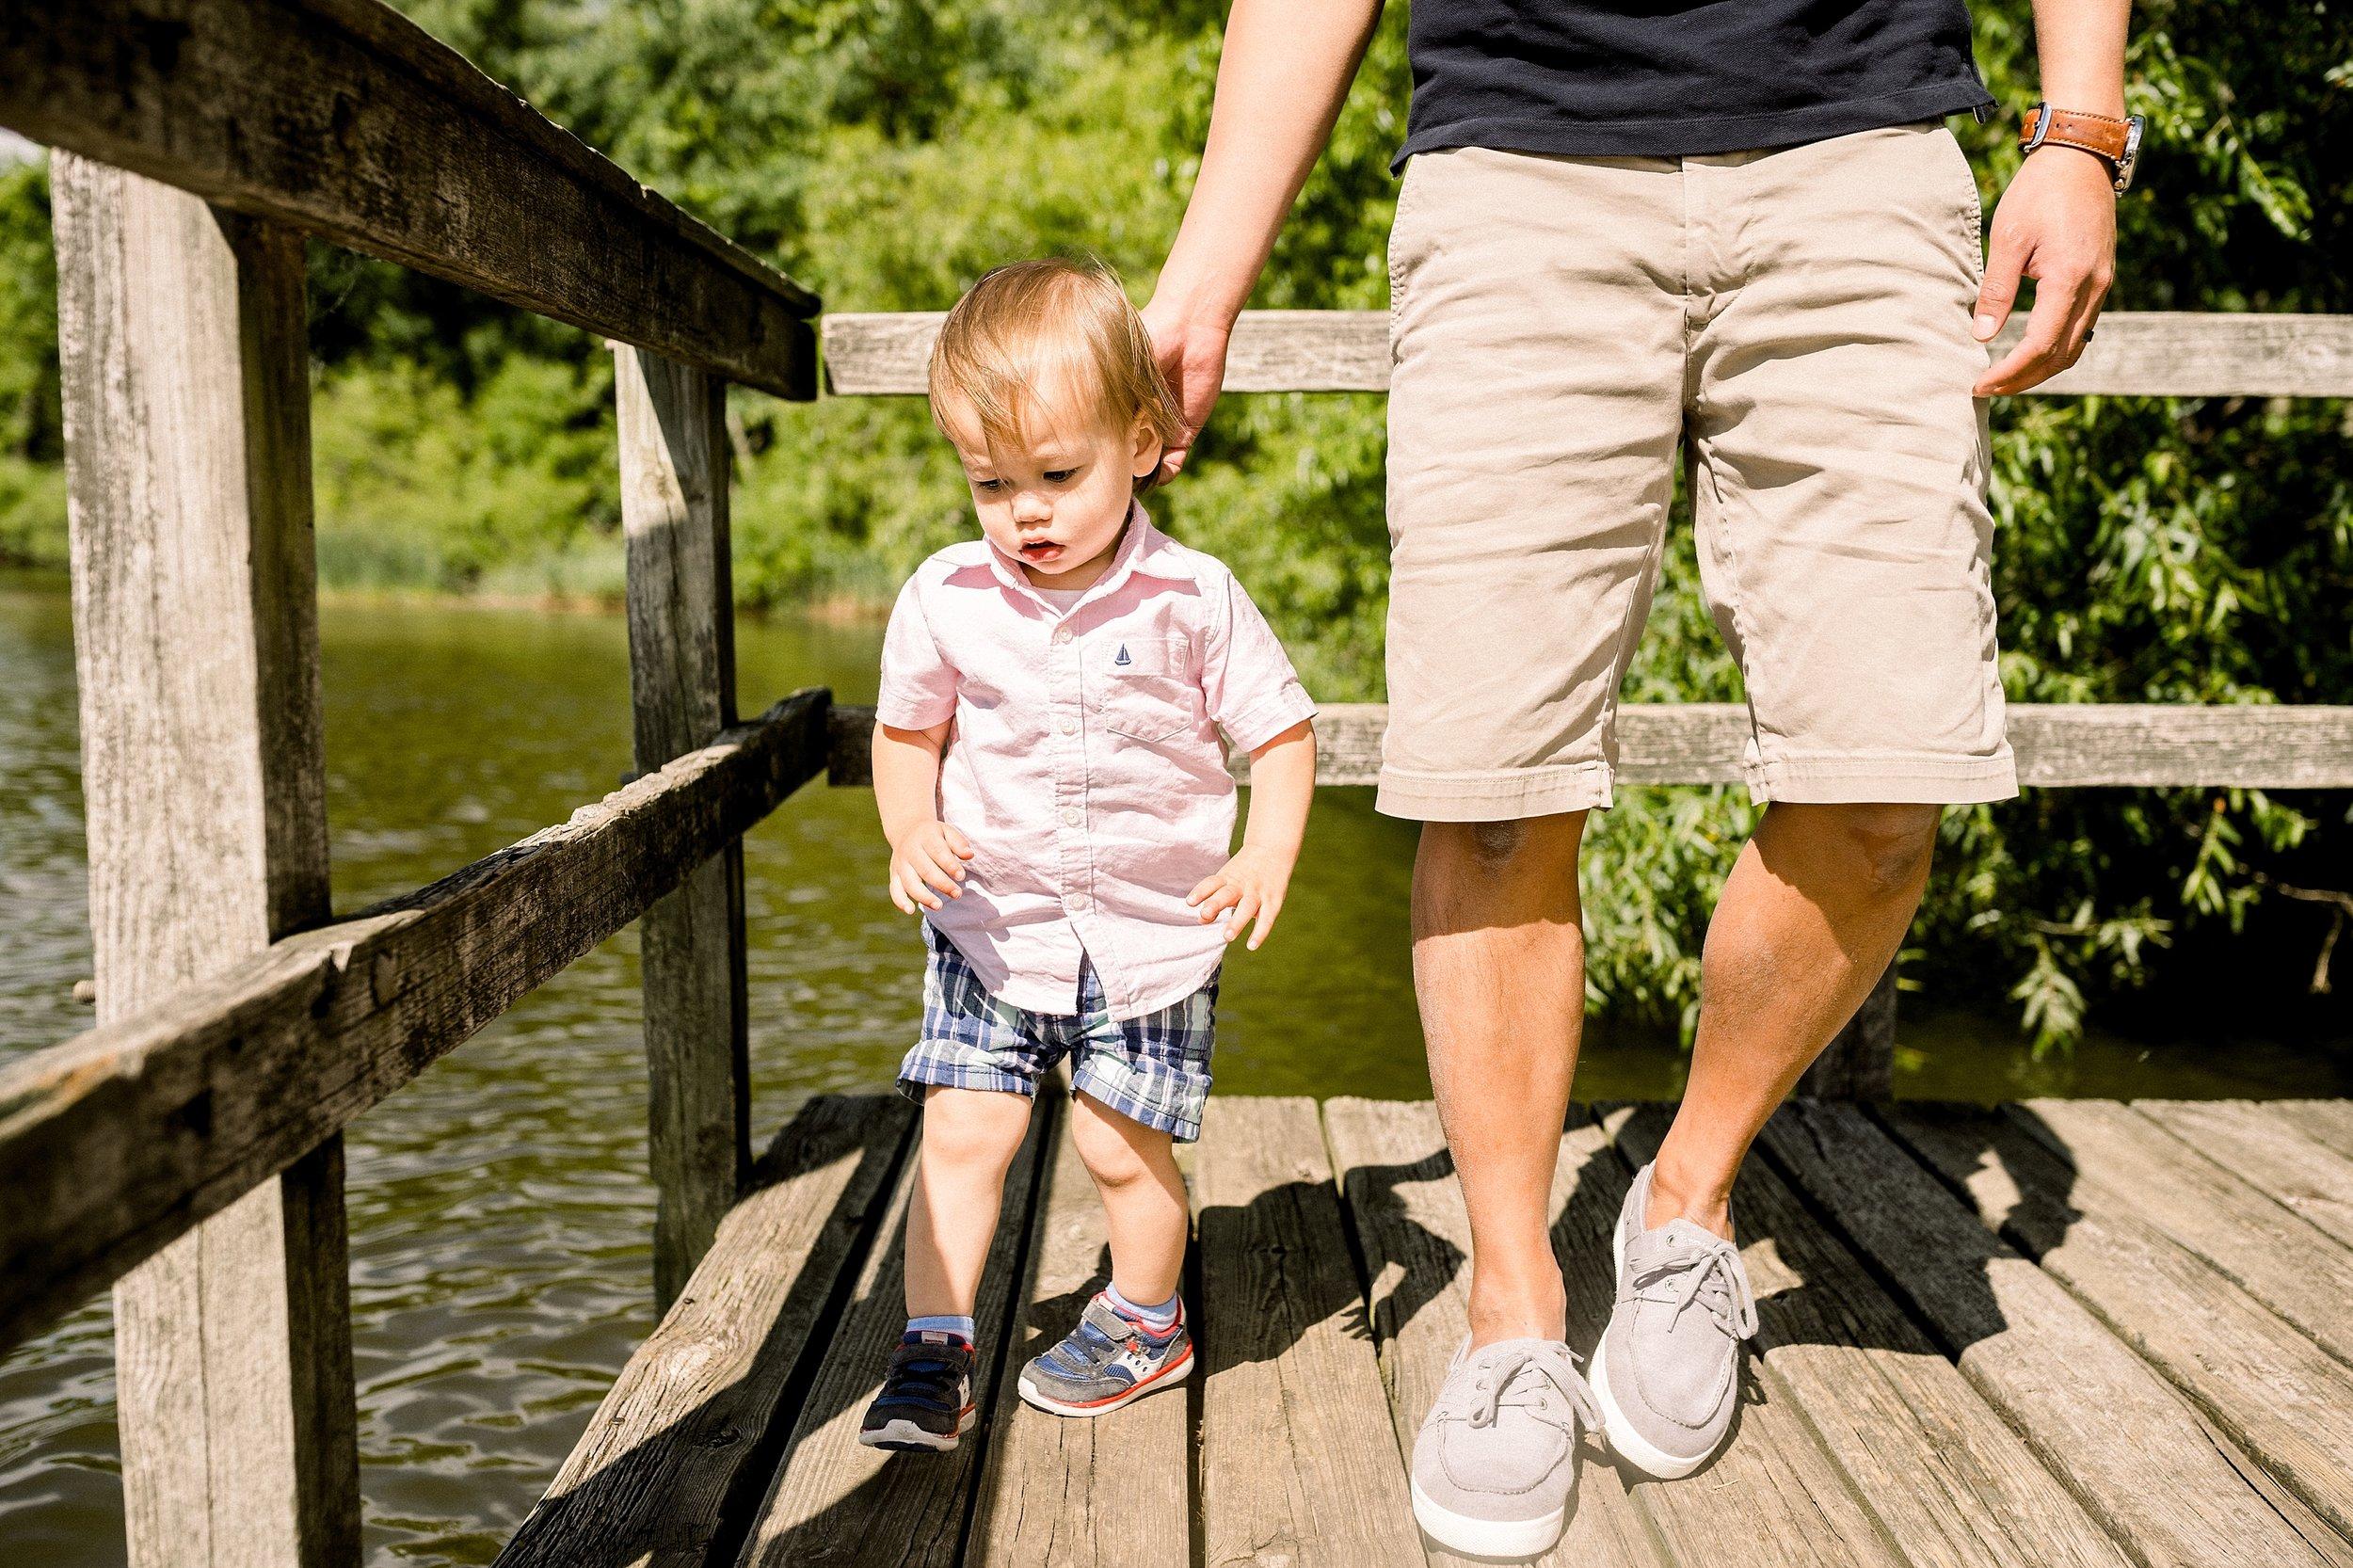 Bucks-County-Family-Photographer_0005-1.jpg